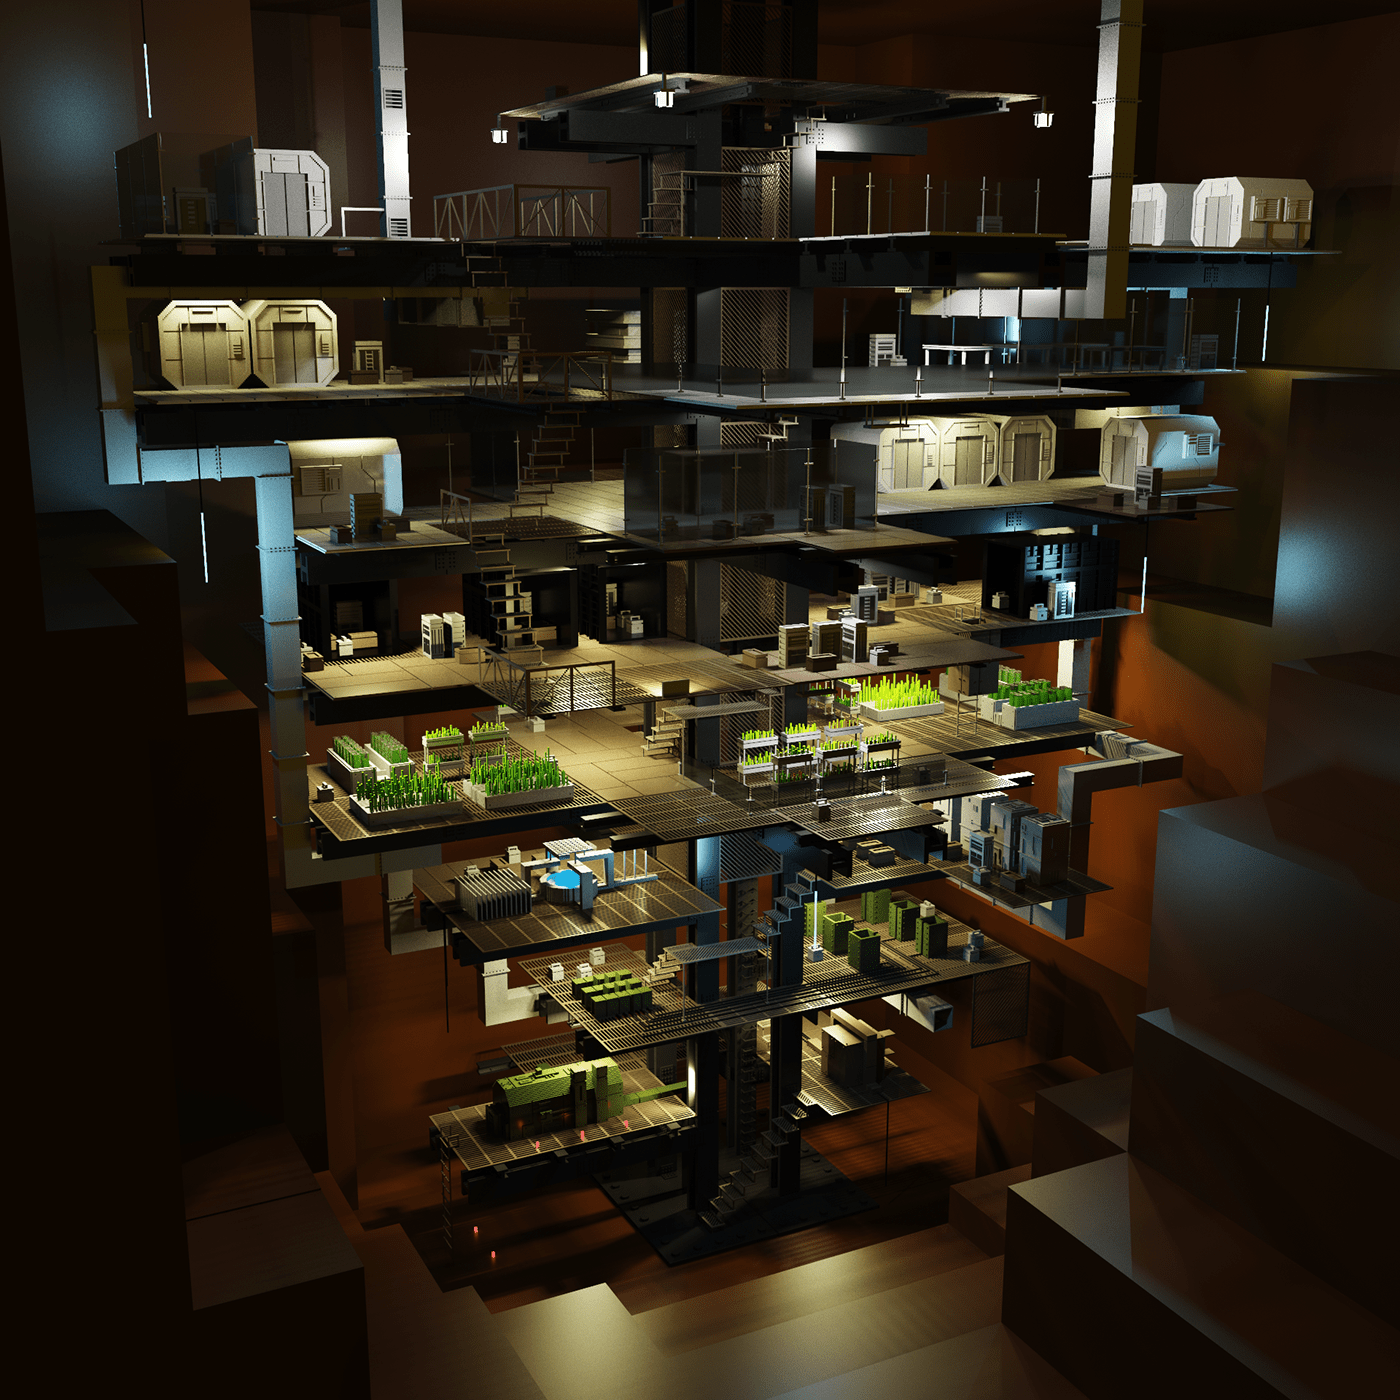 bunker sci-fi environment 3D voxelart voxel shelter lowpoly concept science fiction